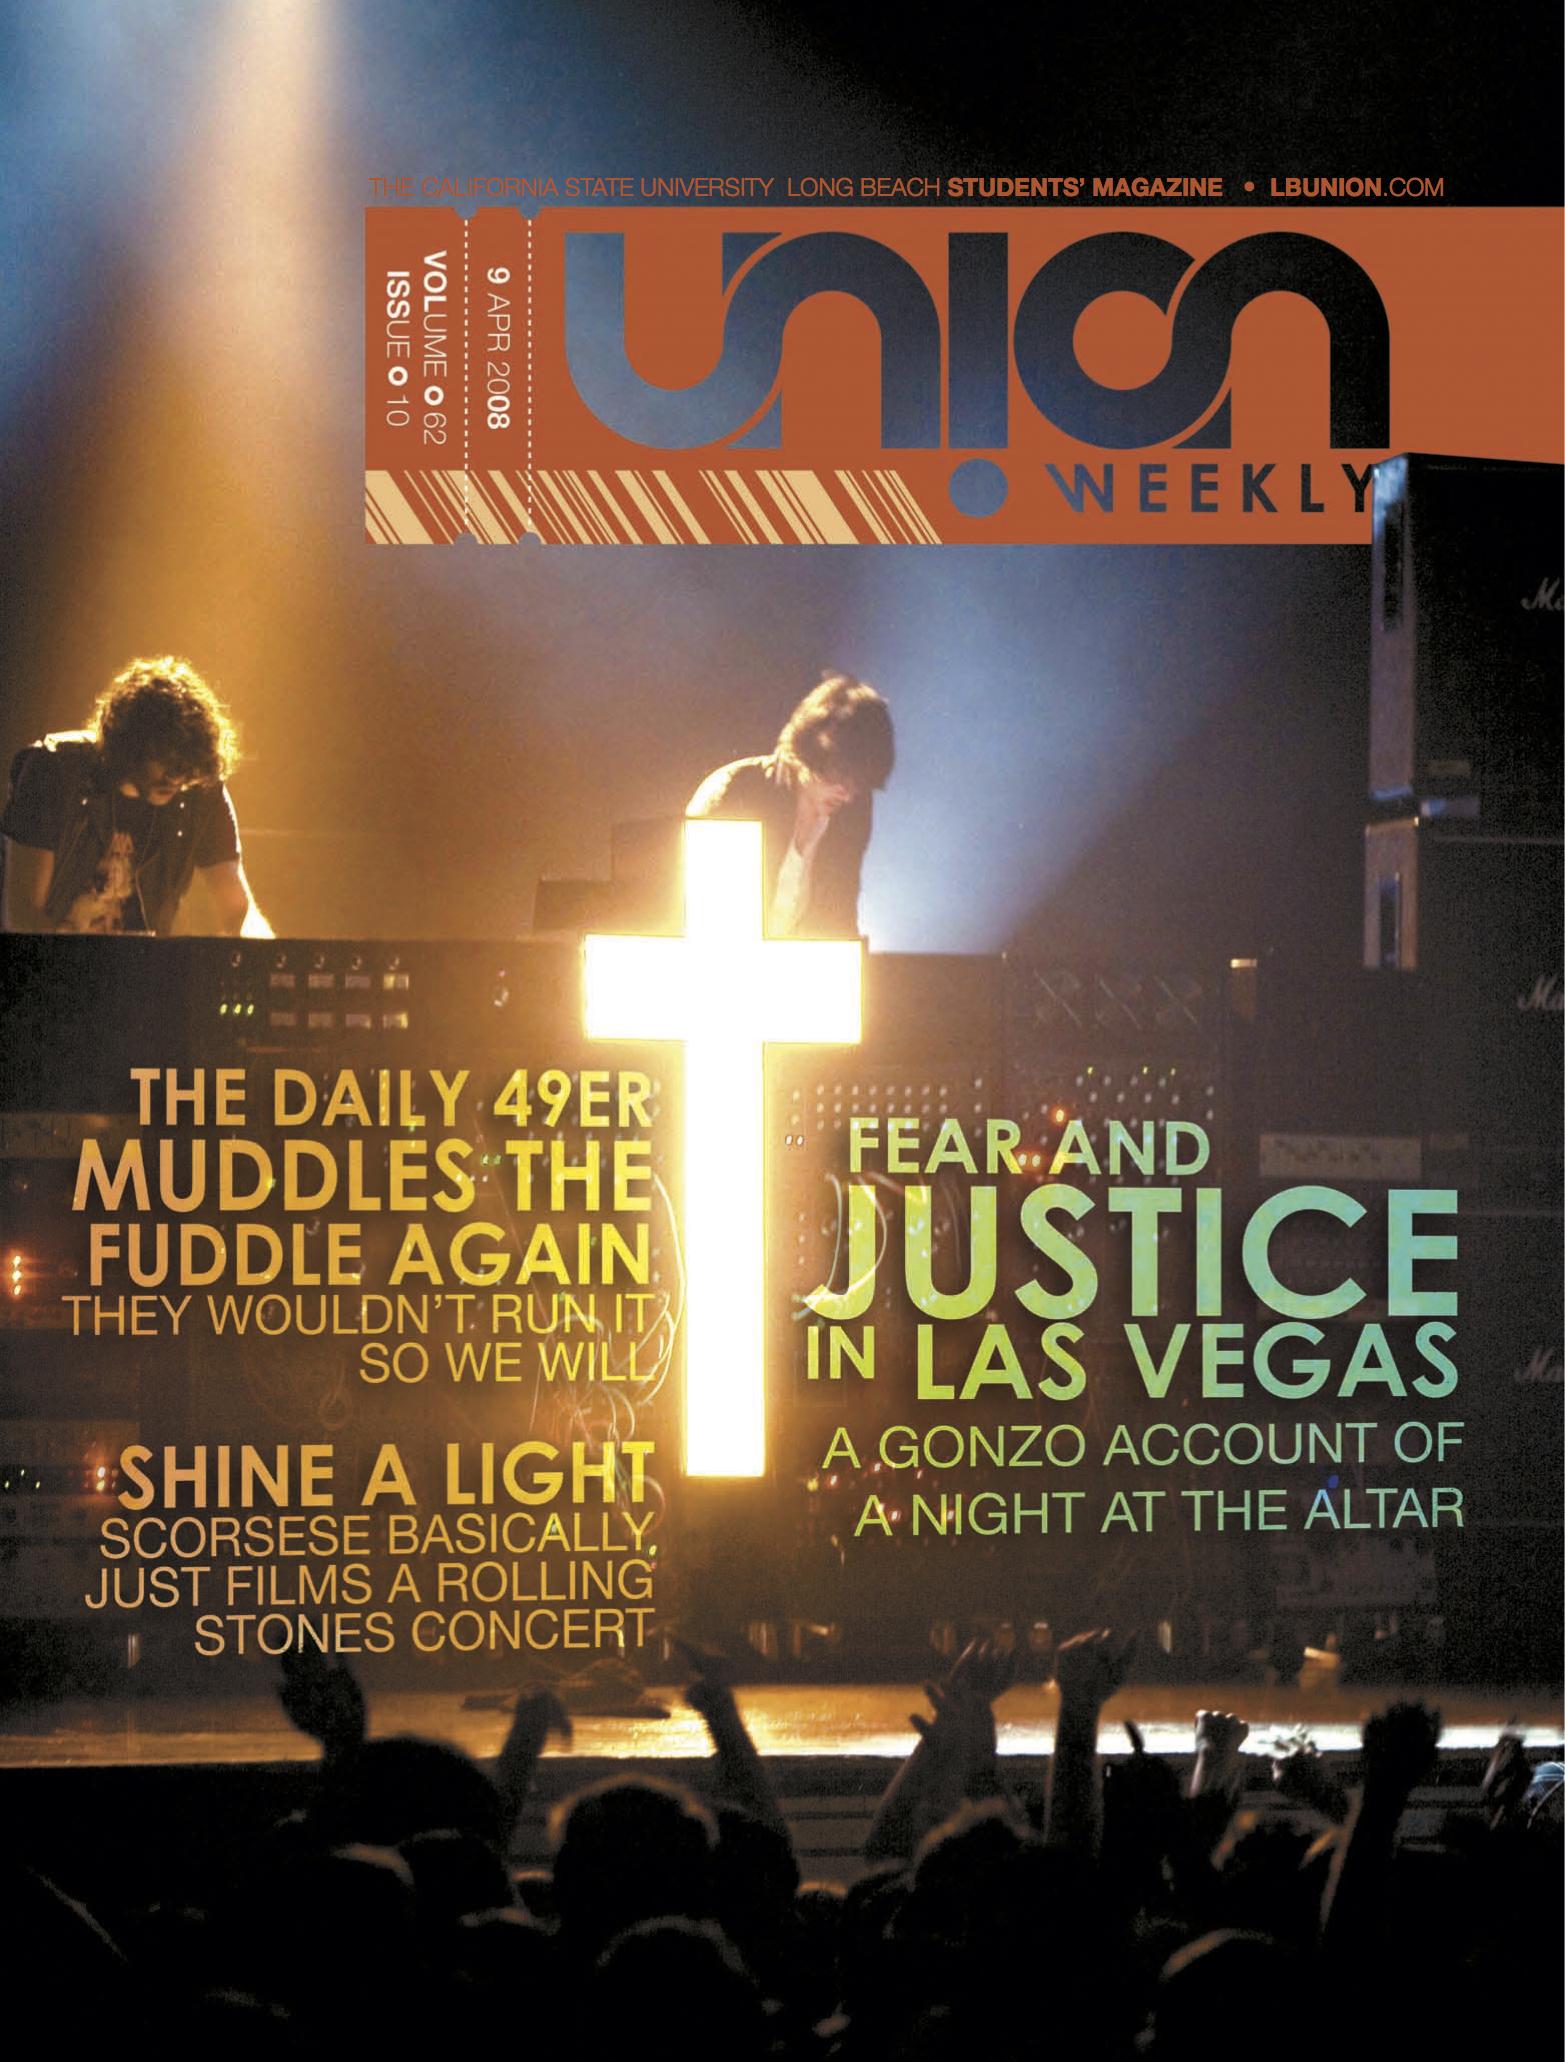 Justice in Las Vegas Issue